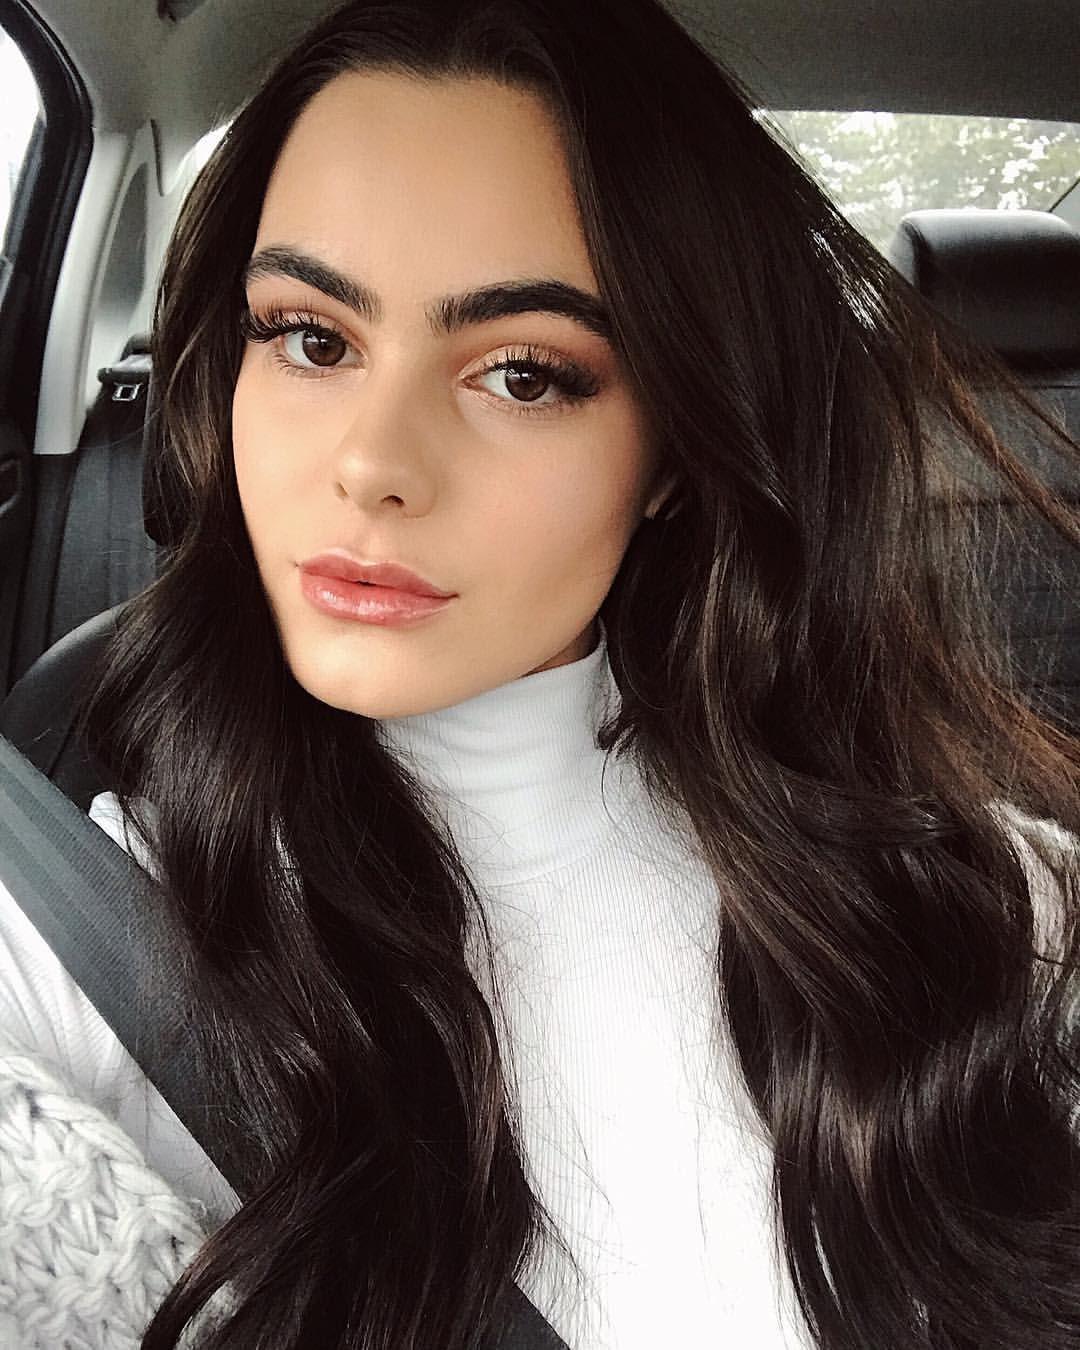 Dark Haired Dreams Photo Of Taraxkellie On Instagram